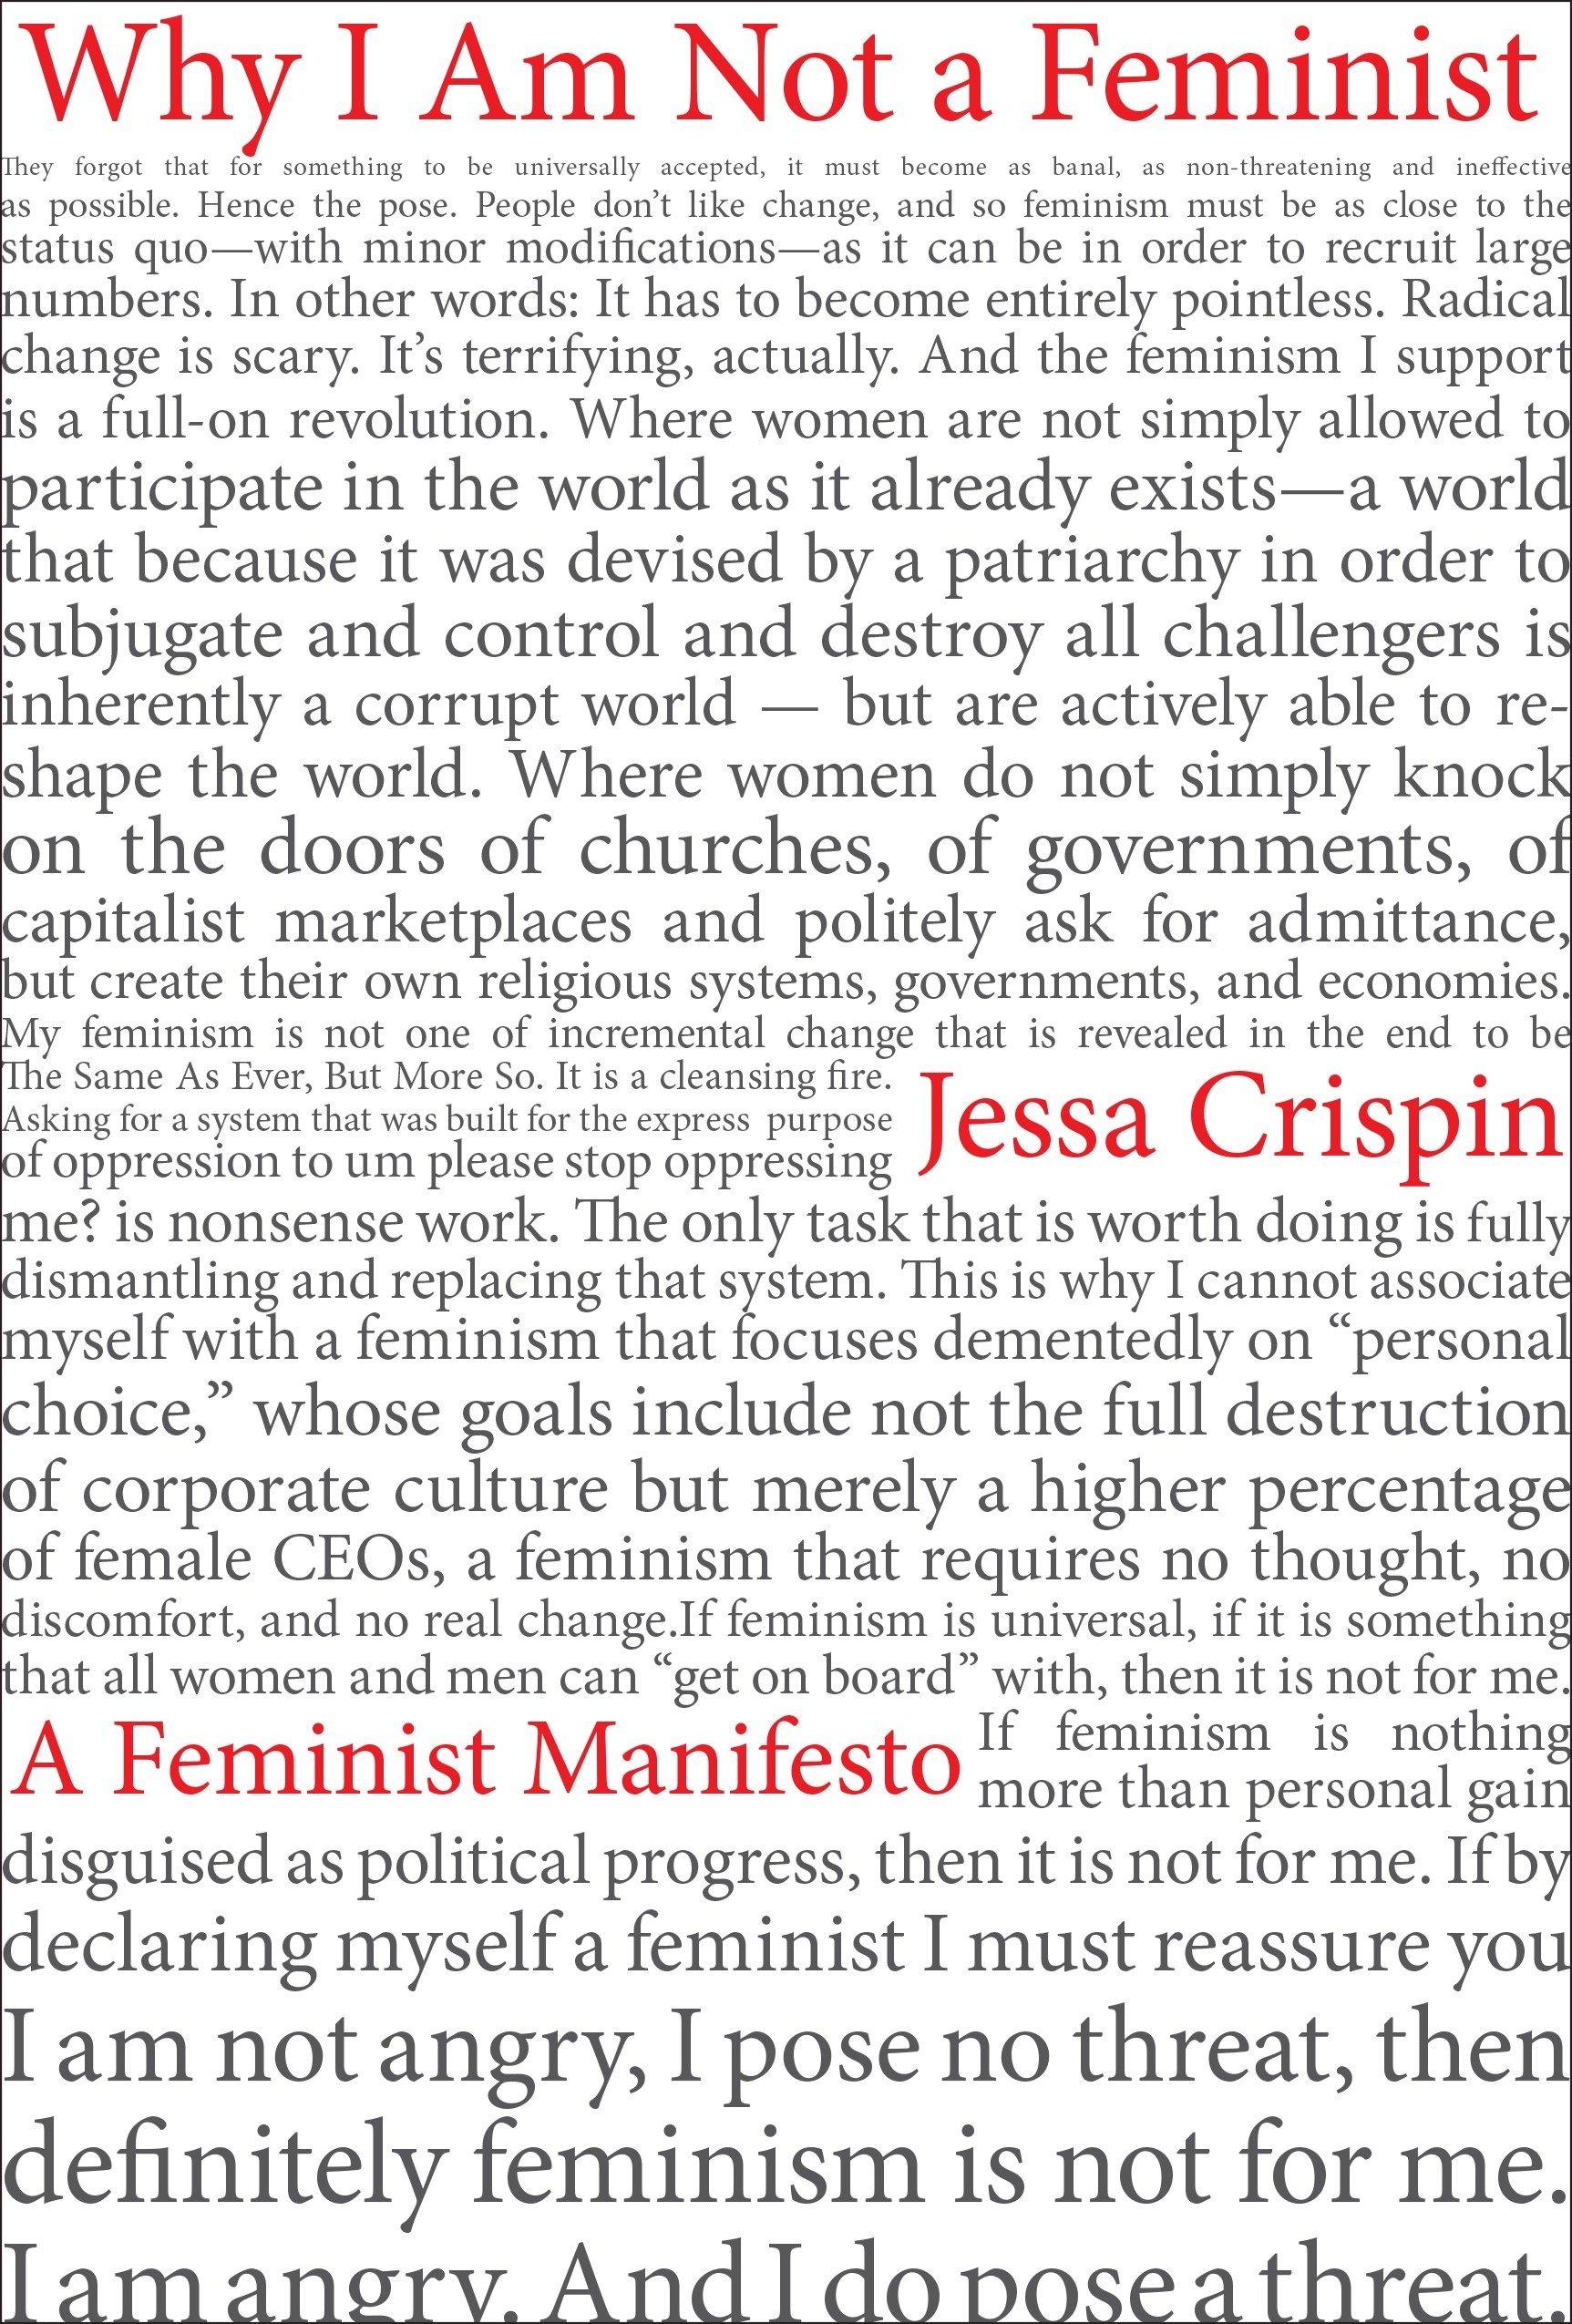 amazon why i am not a feminist a feminist manifesto jessa